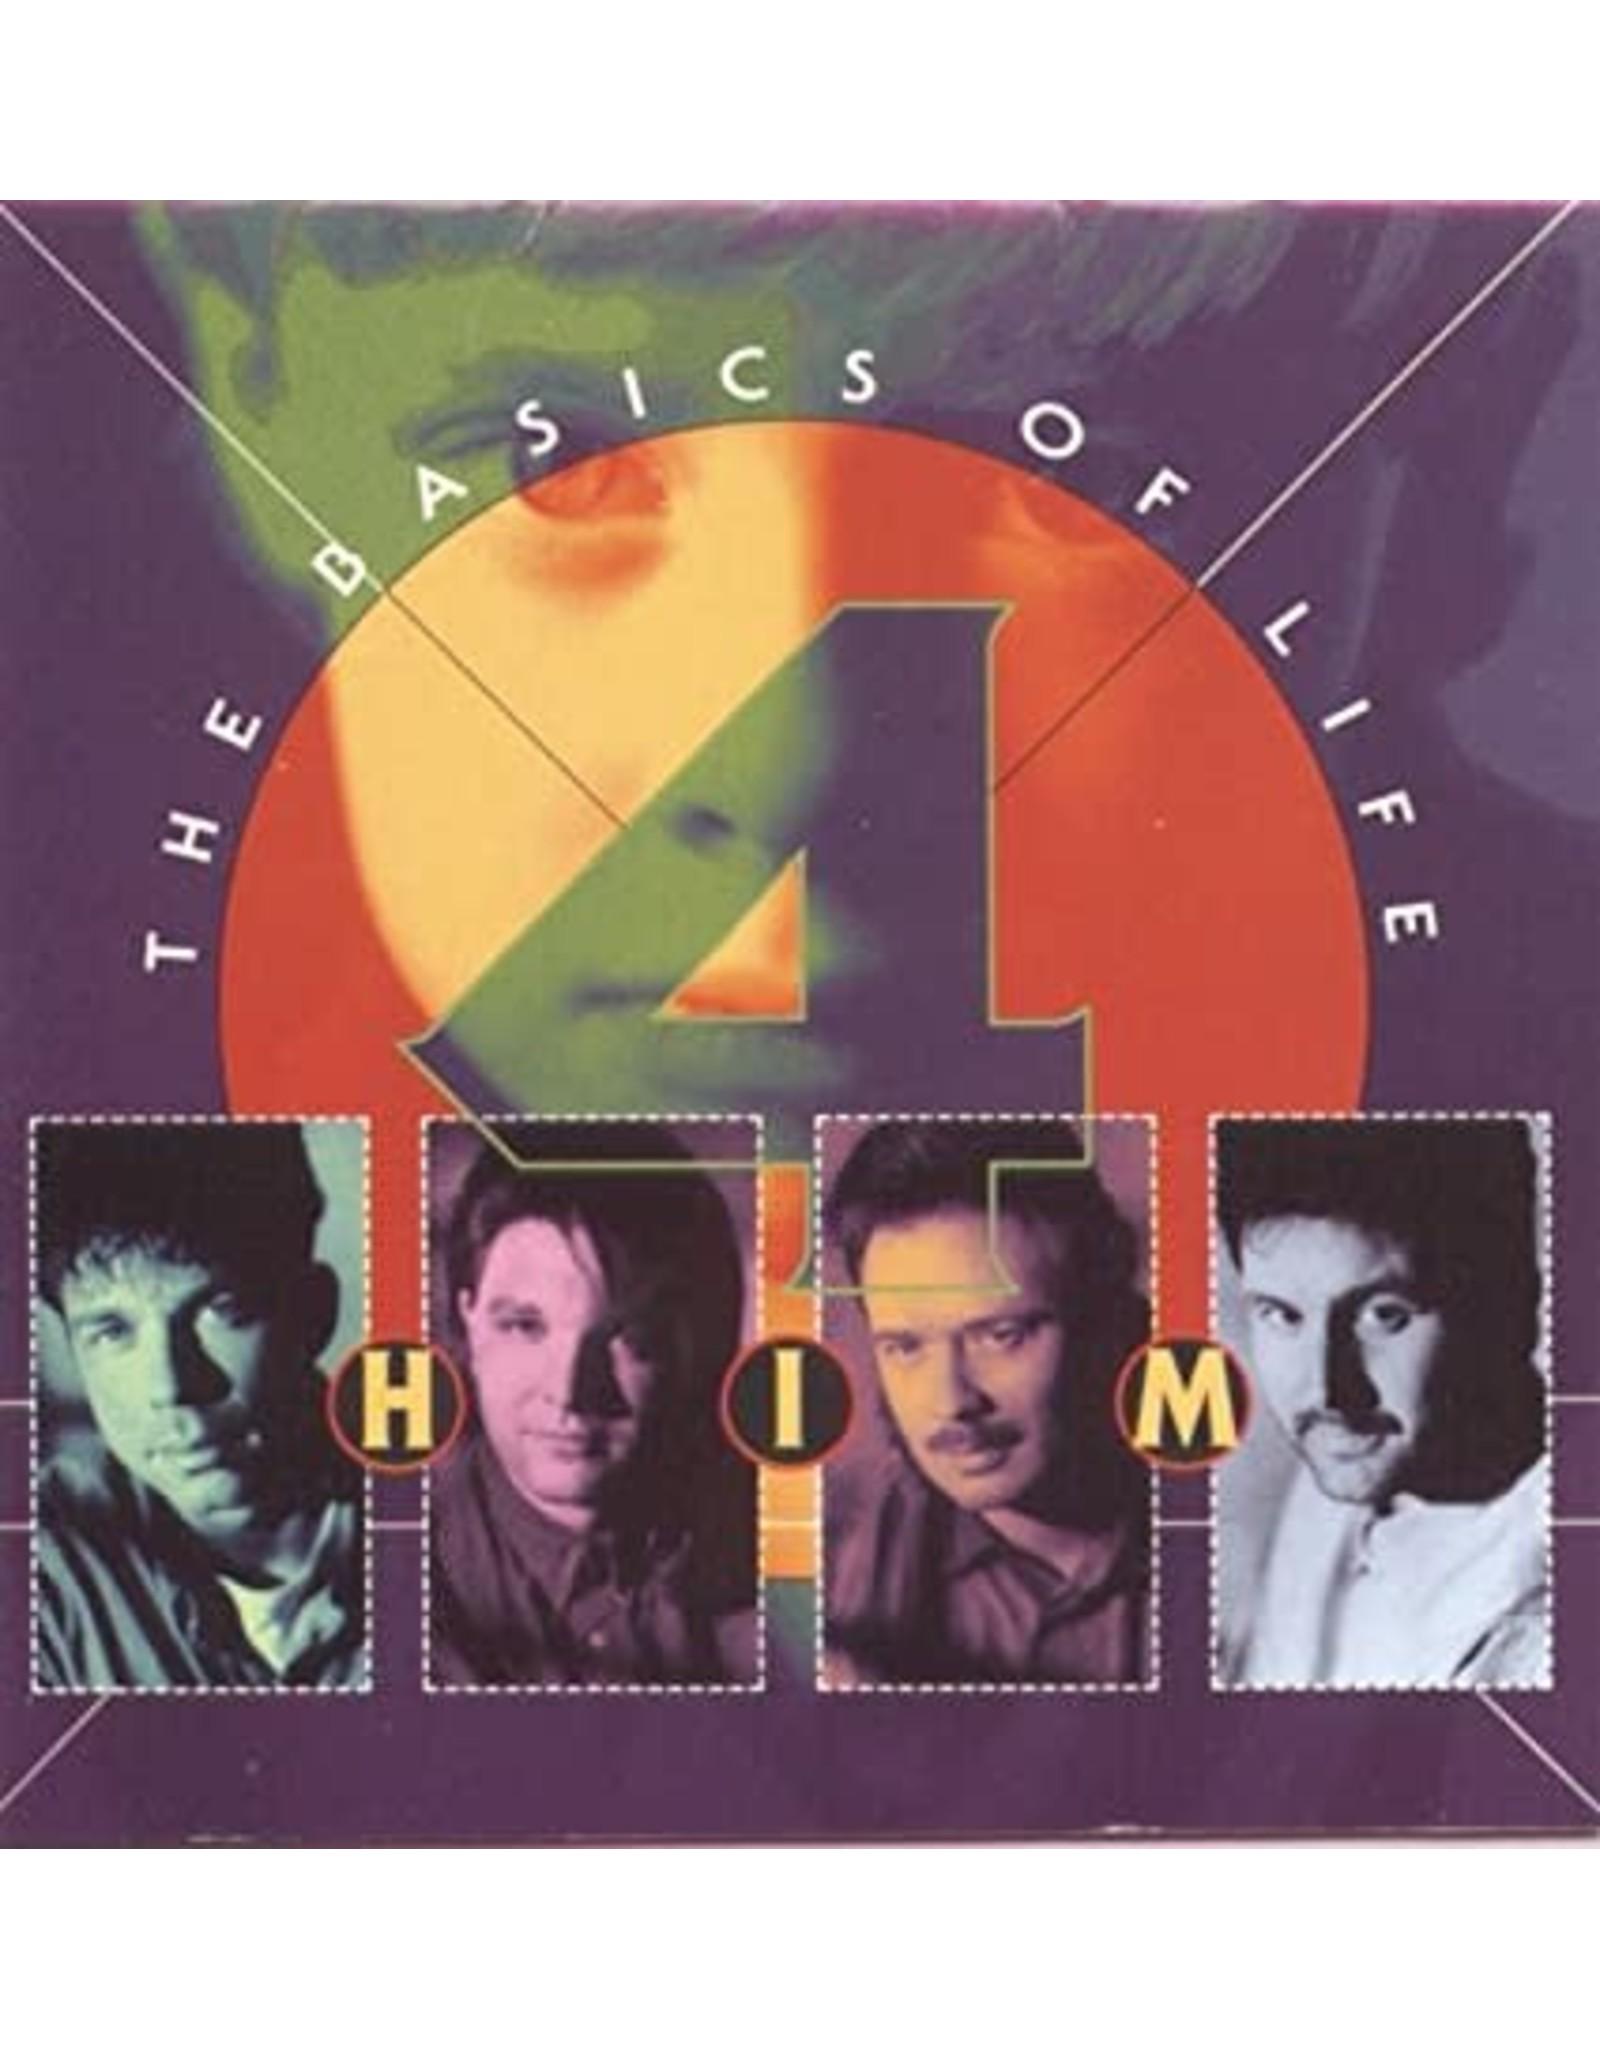 The Basics of Life CD - 4HIM